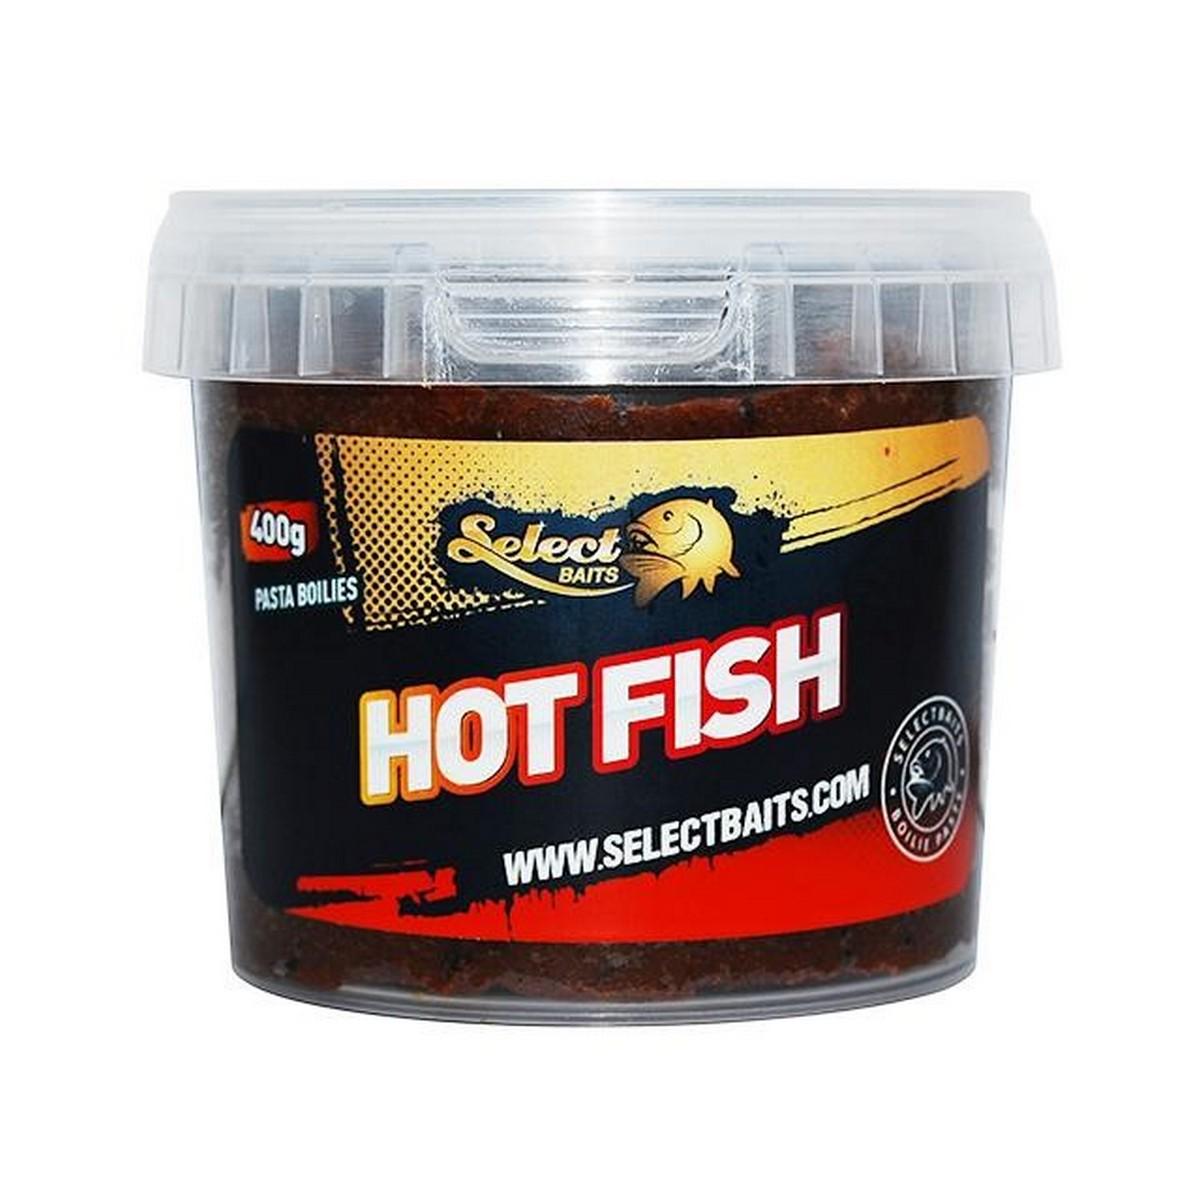 Паста за боили Select Baits Hot Fish Pasta Boilies